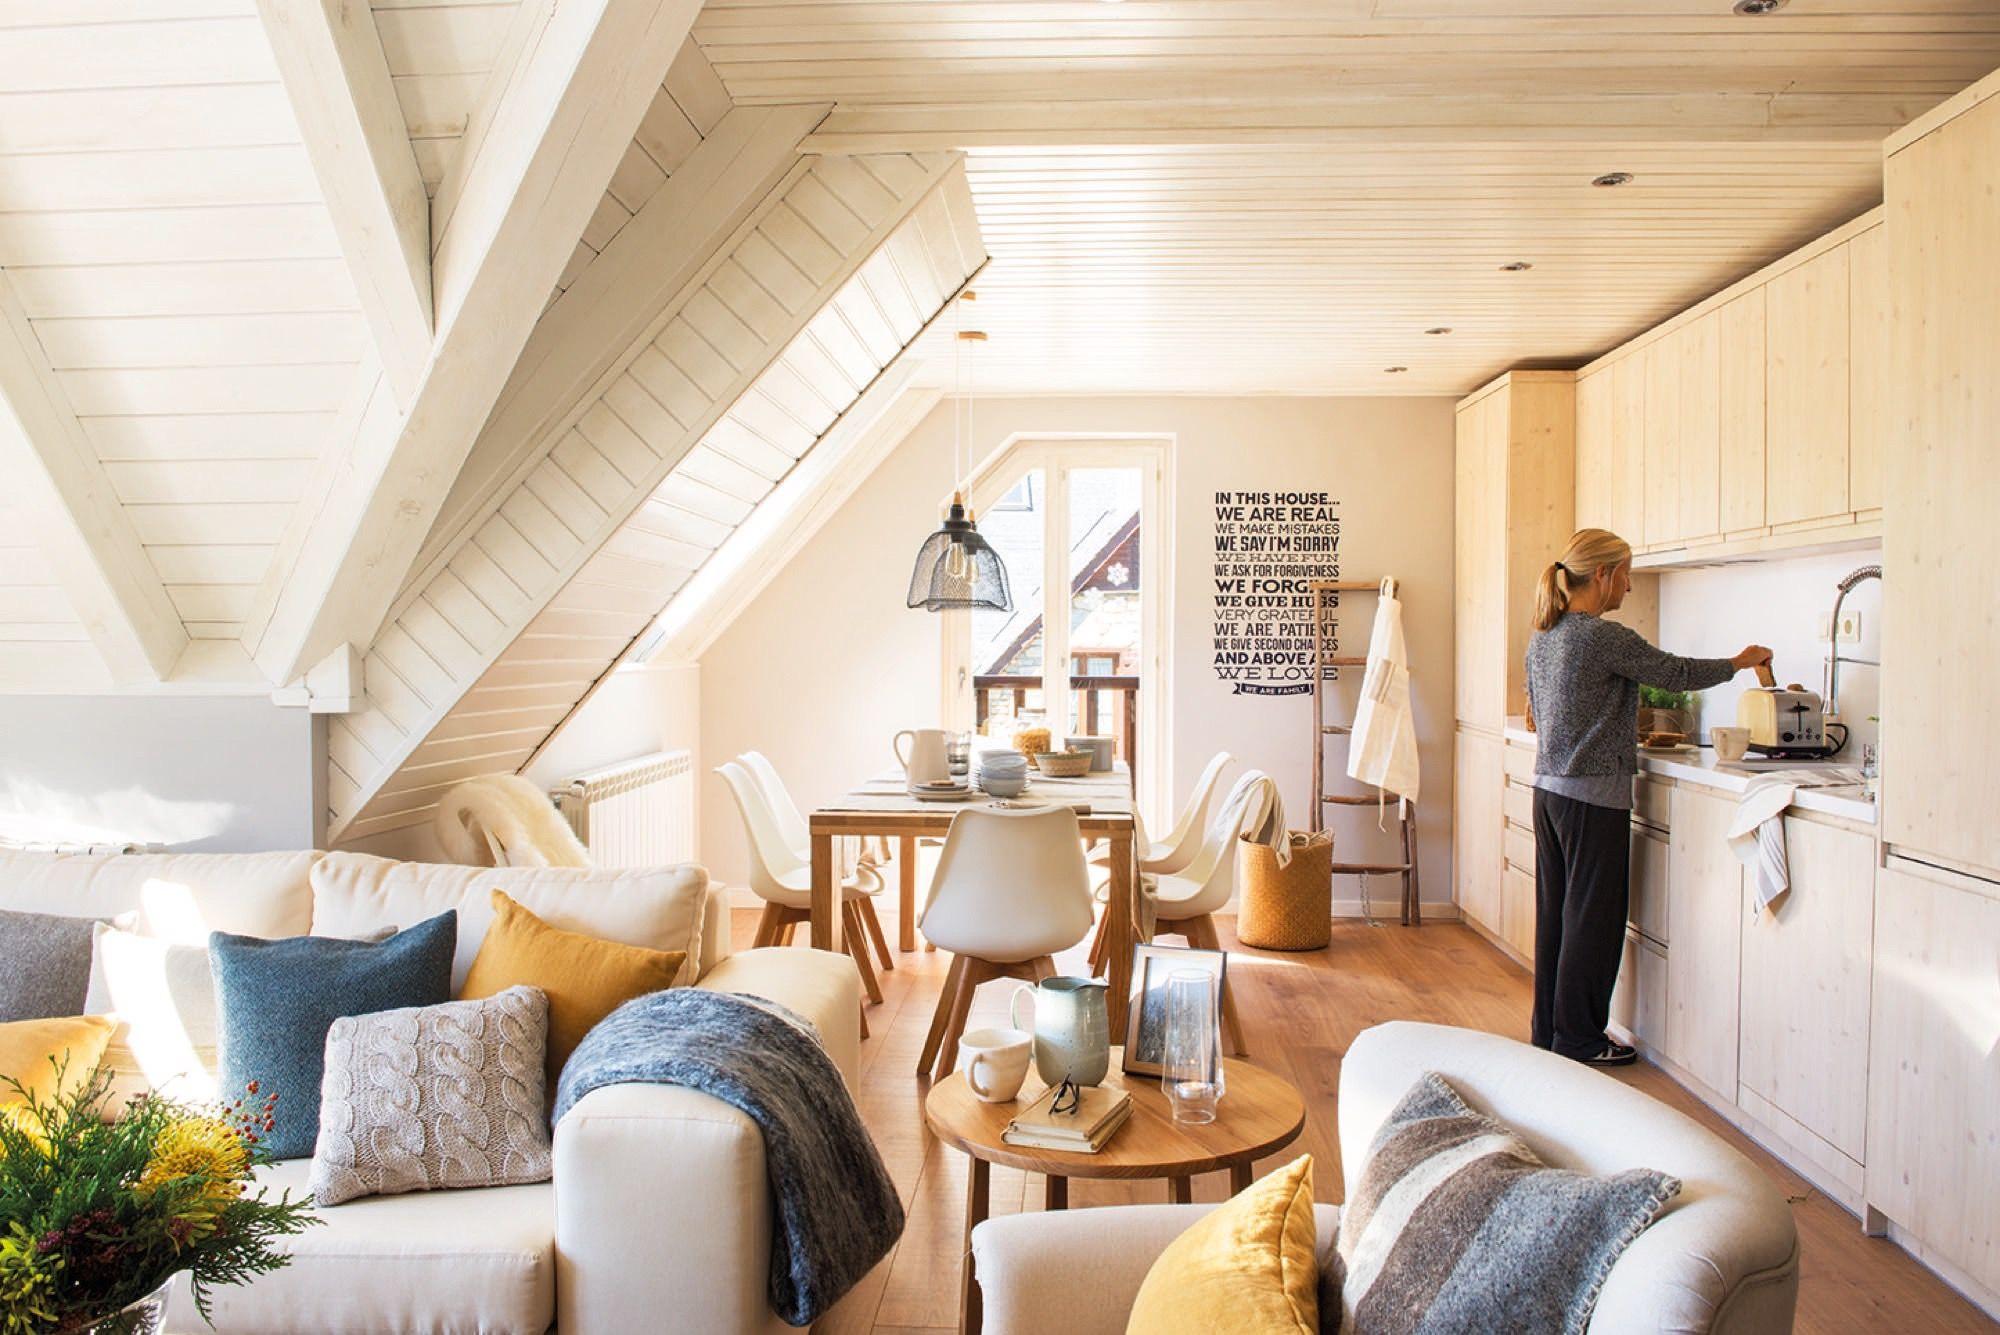 Comedor salon de un piso peque o semi abuhardillado en la for Decoracion piso montana